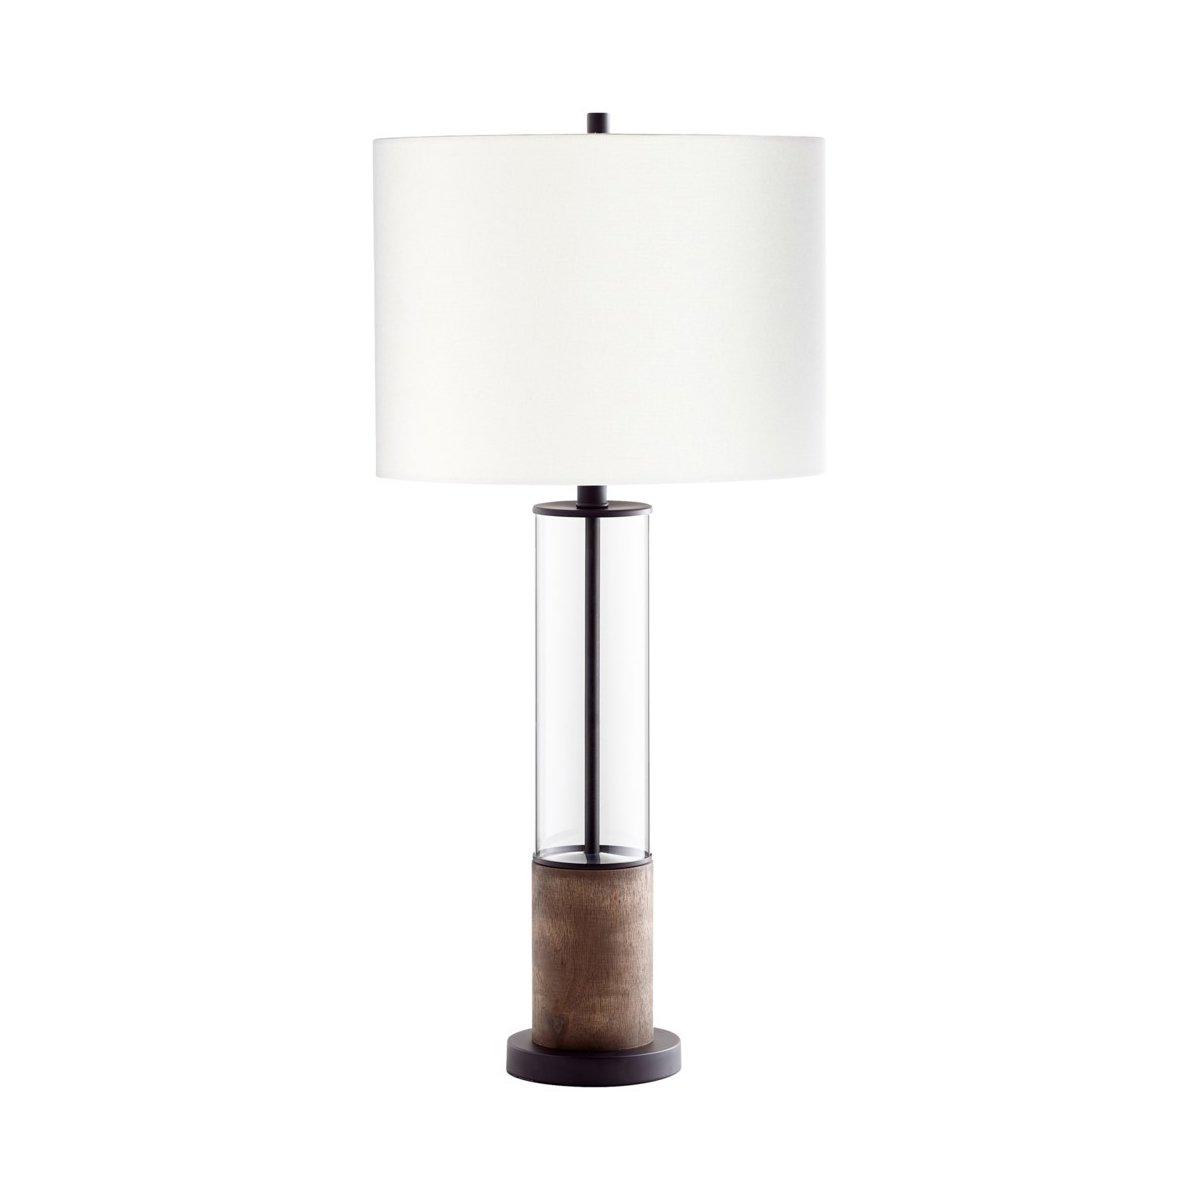 Belknap Table Lamp